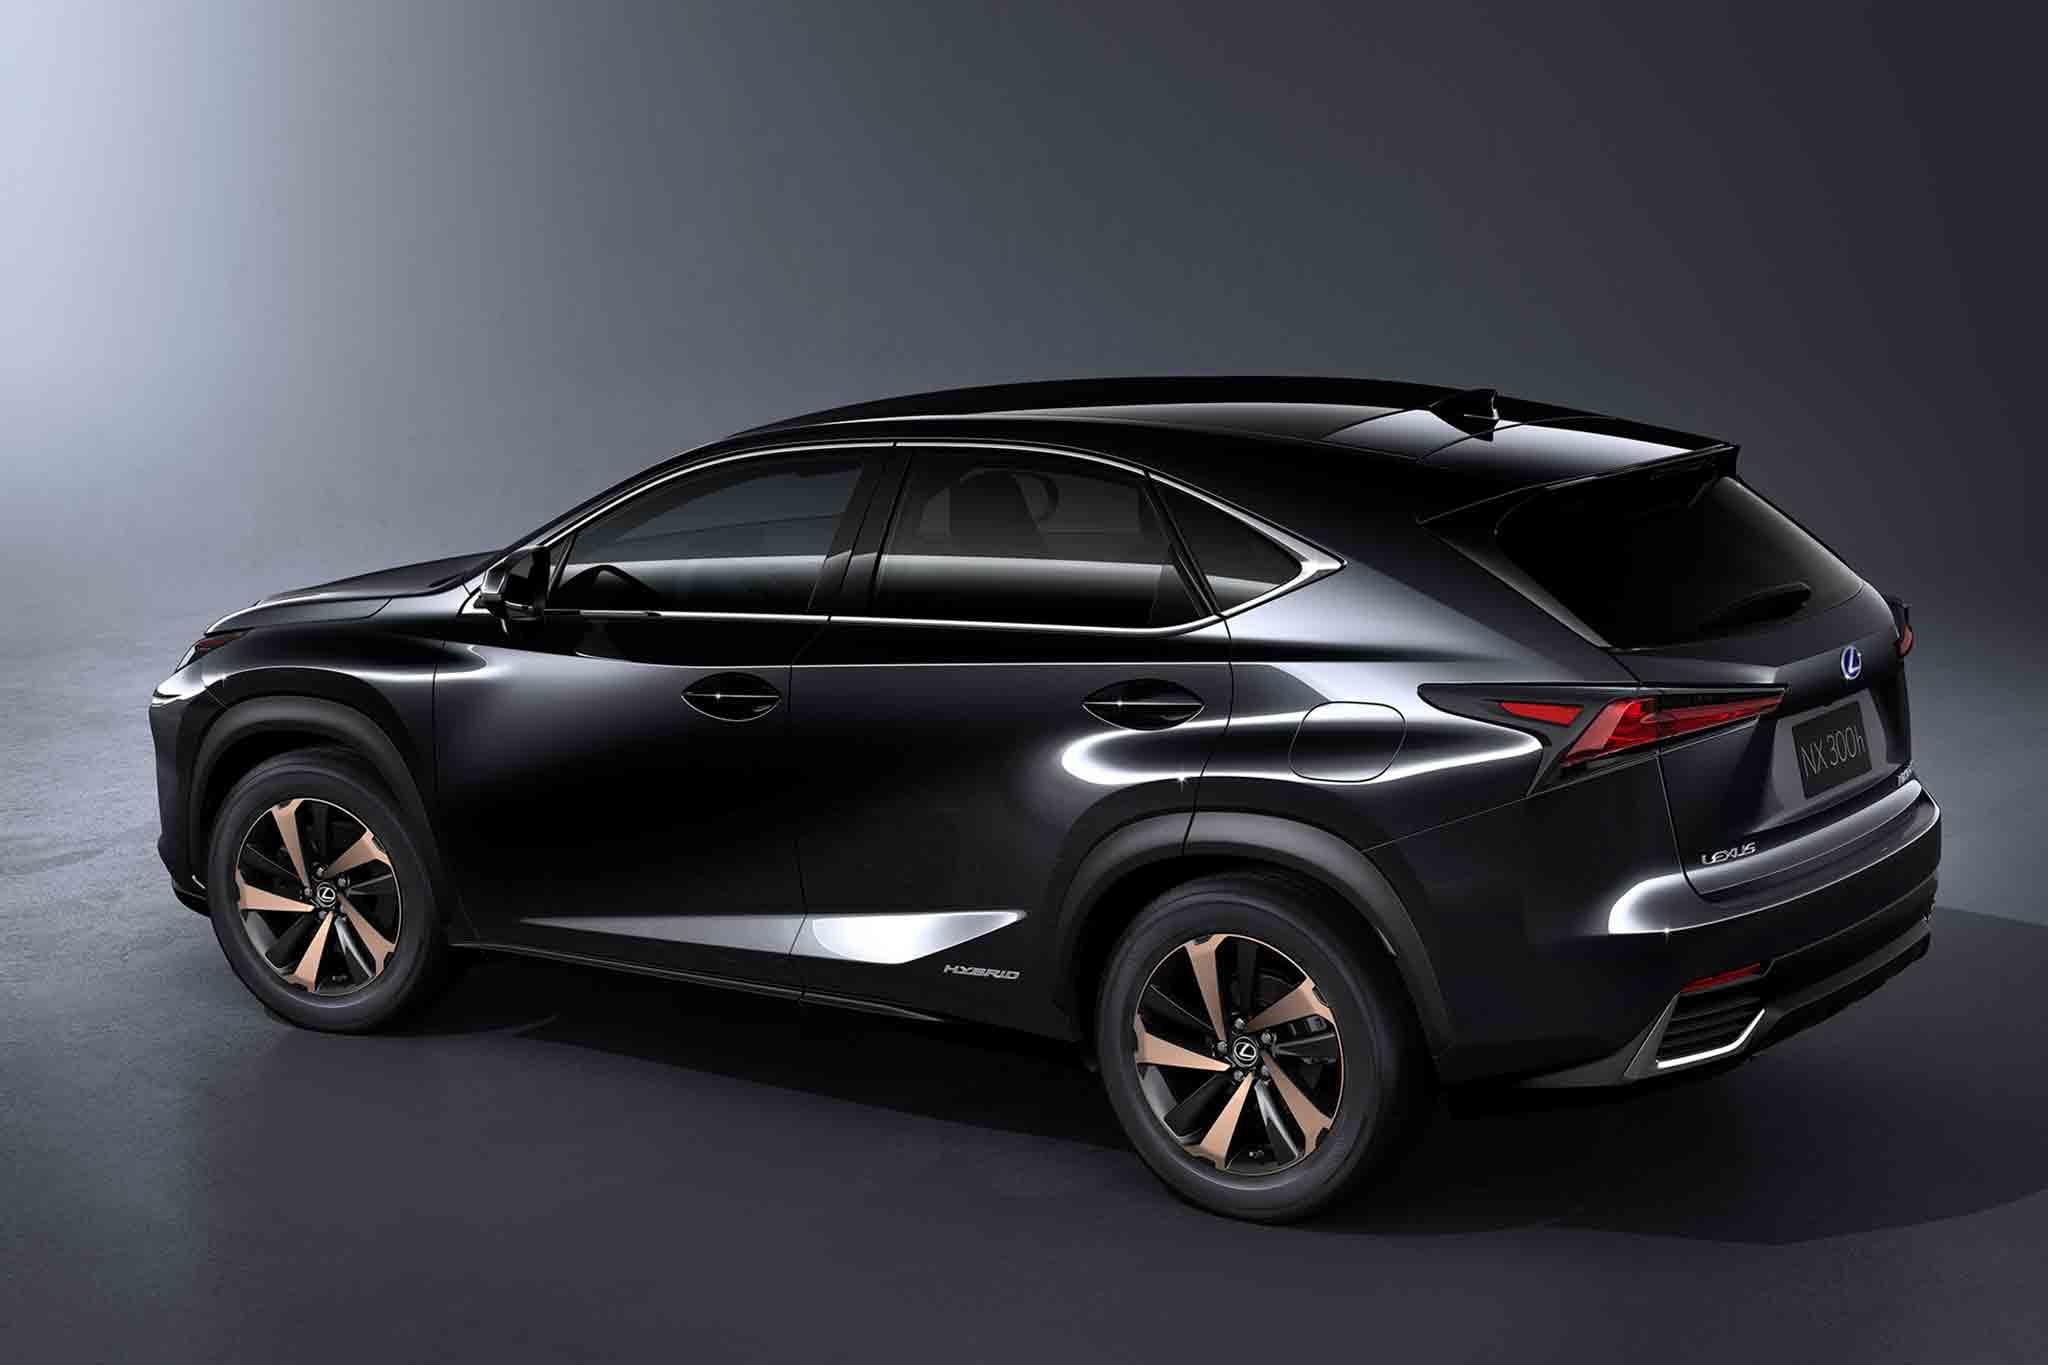 2018 Lexus Nx Shows Off New Design In Shanghai